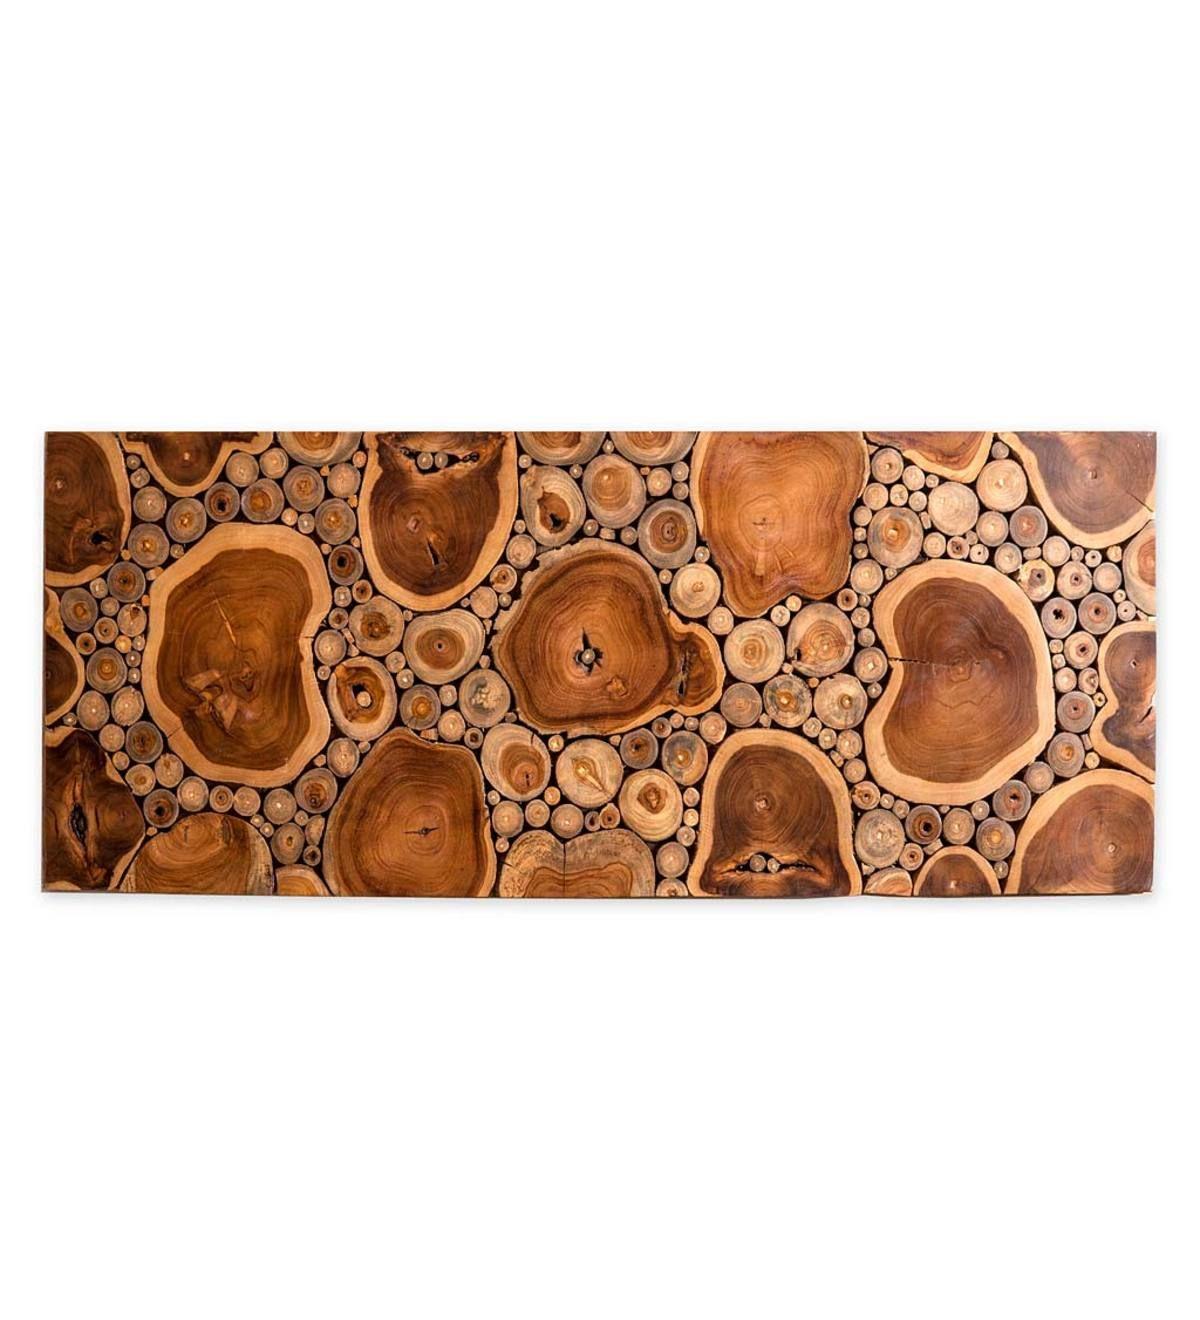 Pin By Lidiaorlandi On Ispirazione In 2020 Wood Panel Walls Wood Paneling Teak Decor